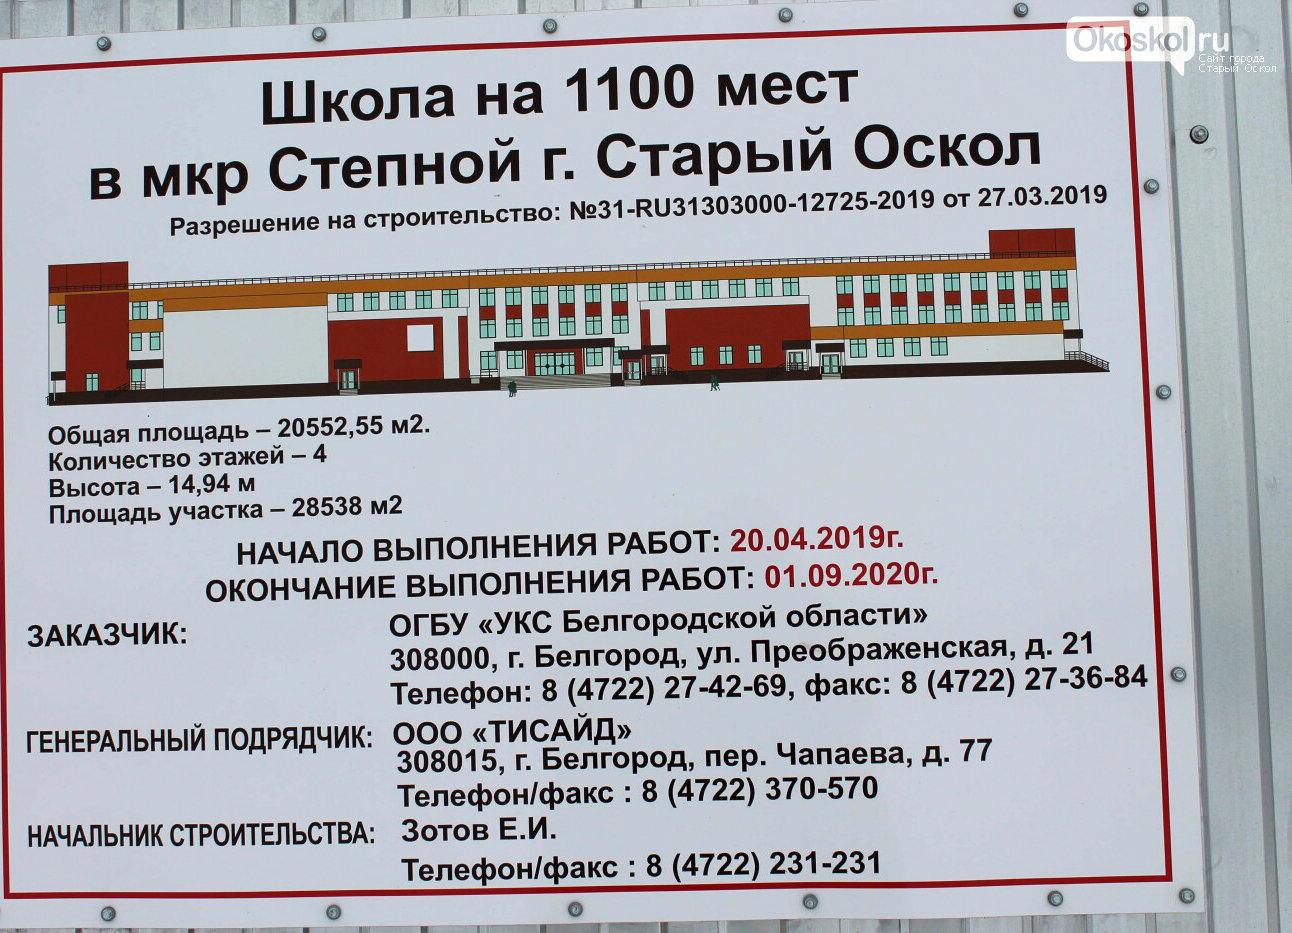 Паспорт объекта строительства